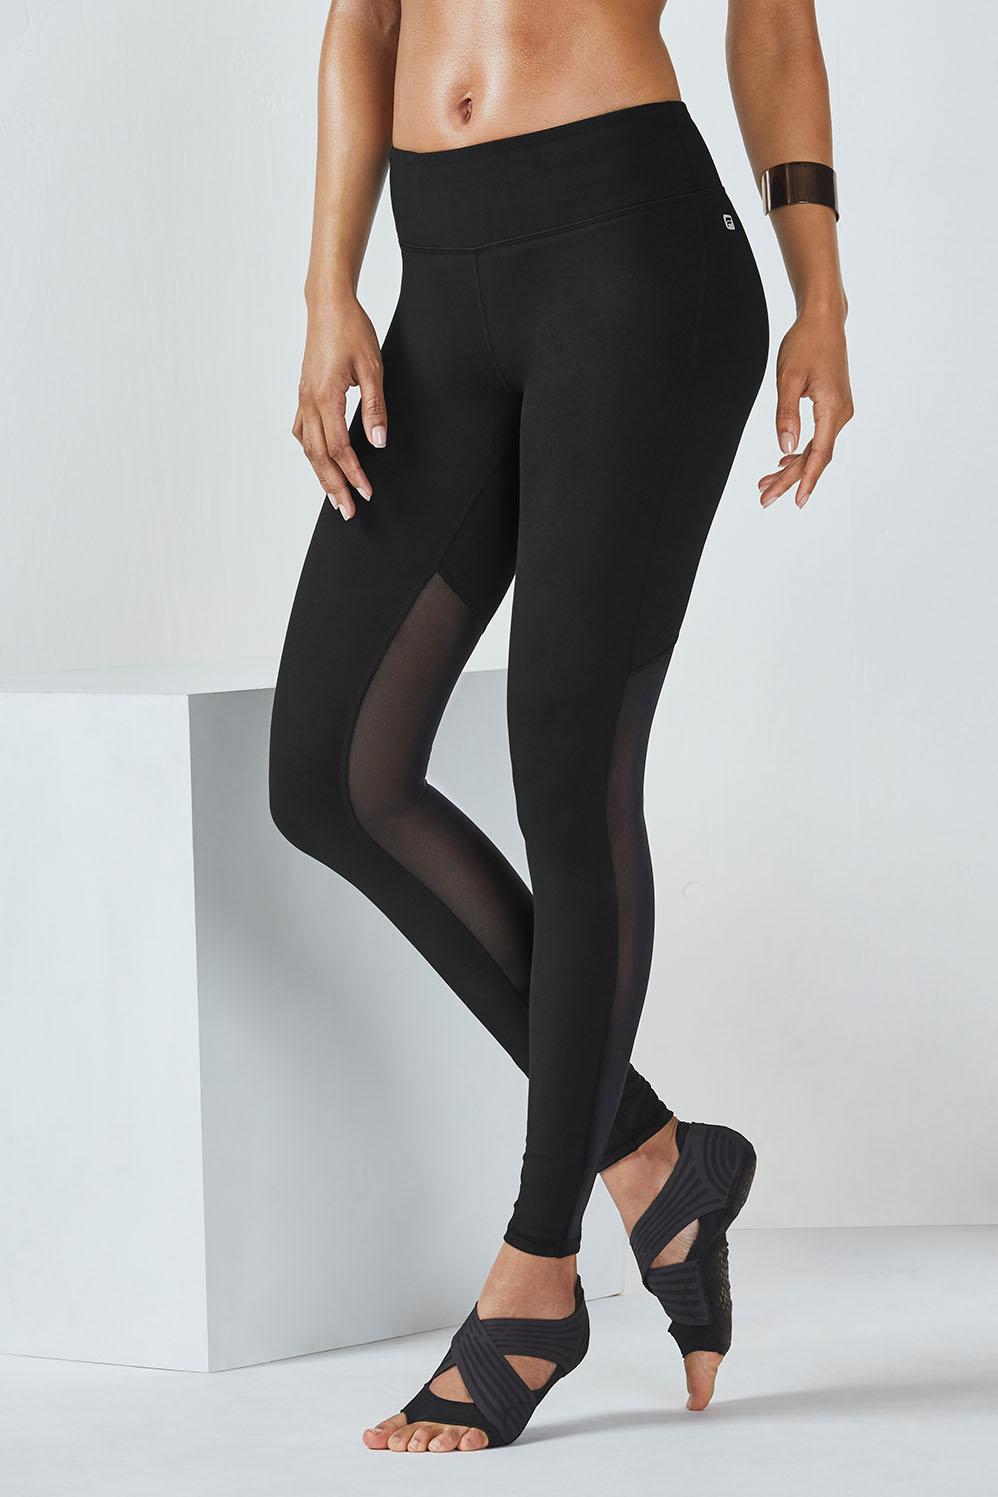 ae9a2e92b7703 Rocha Legging - Fabletics